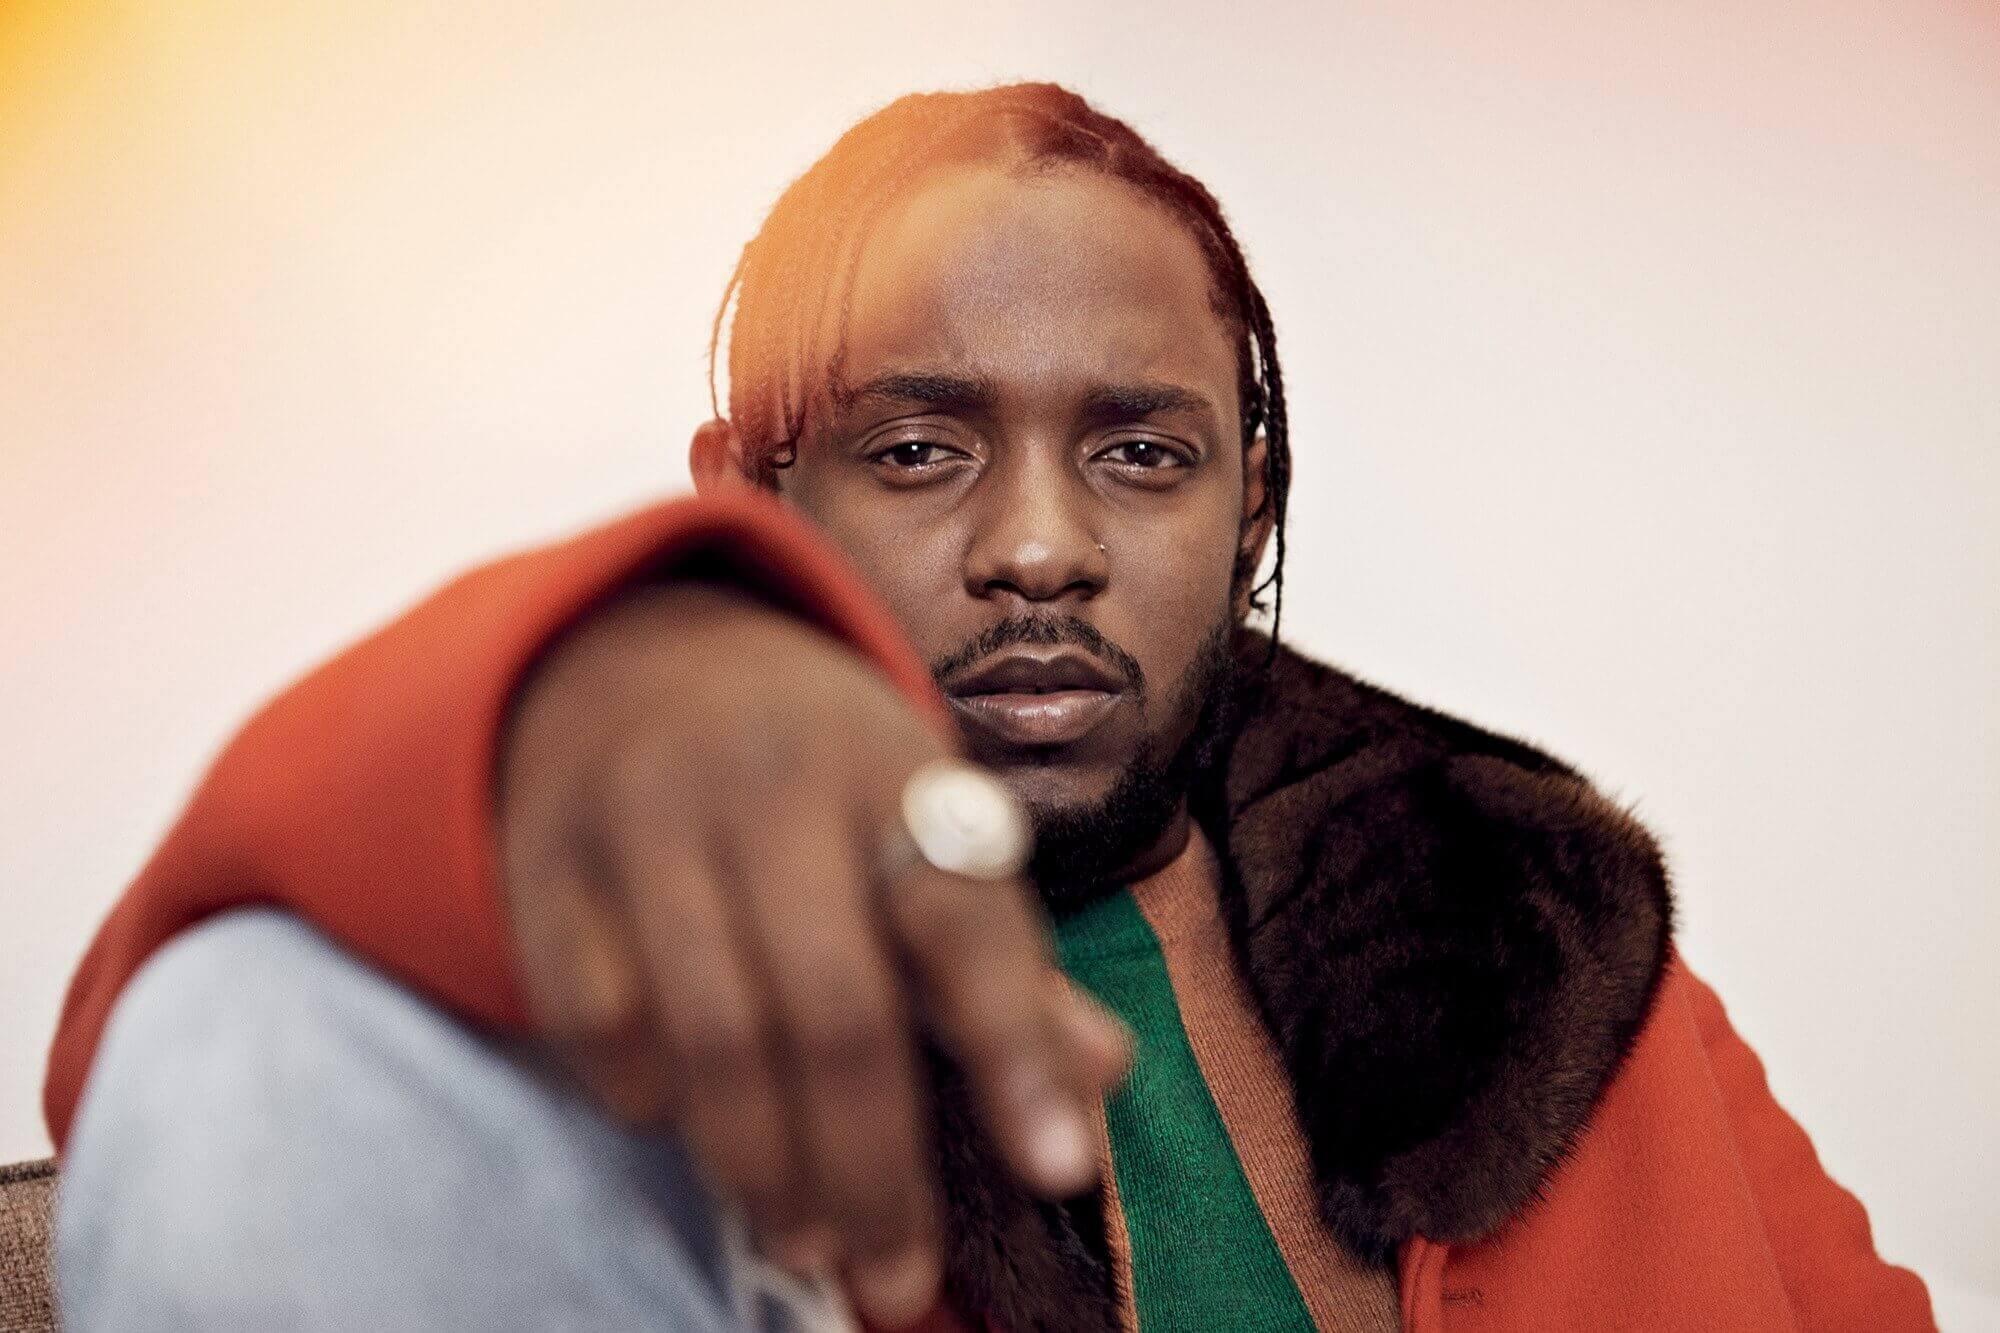 Lollapalooza 2019: Kendrick Lamar, Arctic Monkeys, St. Vincent y Rosalía lideran el lineup